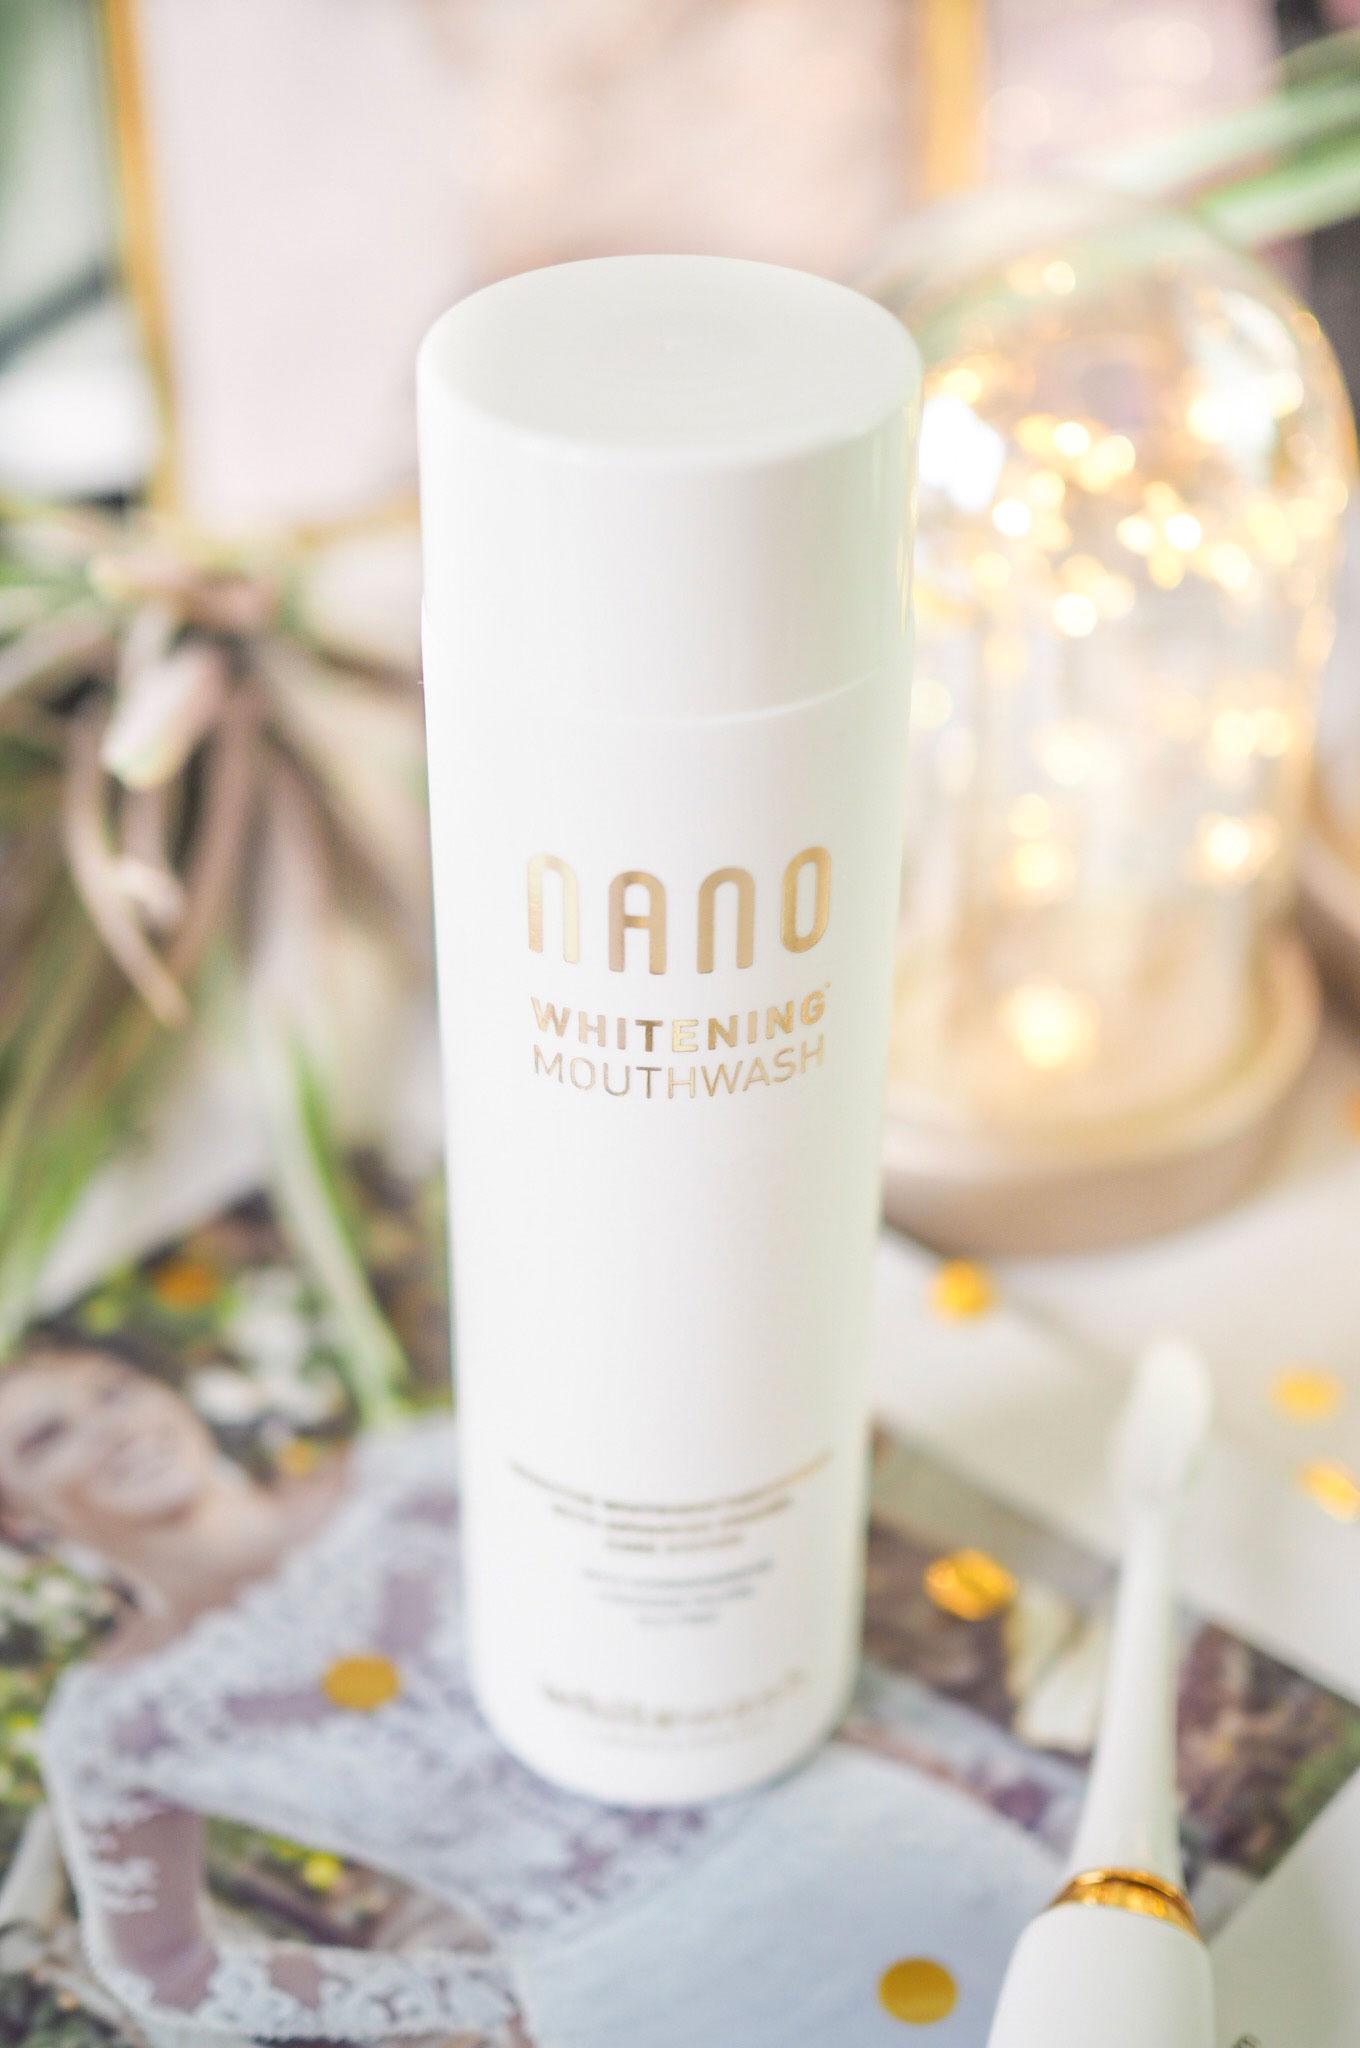 Nano Whitening Mouthwash